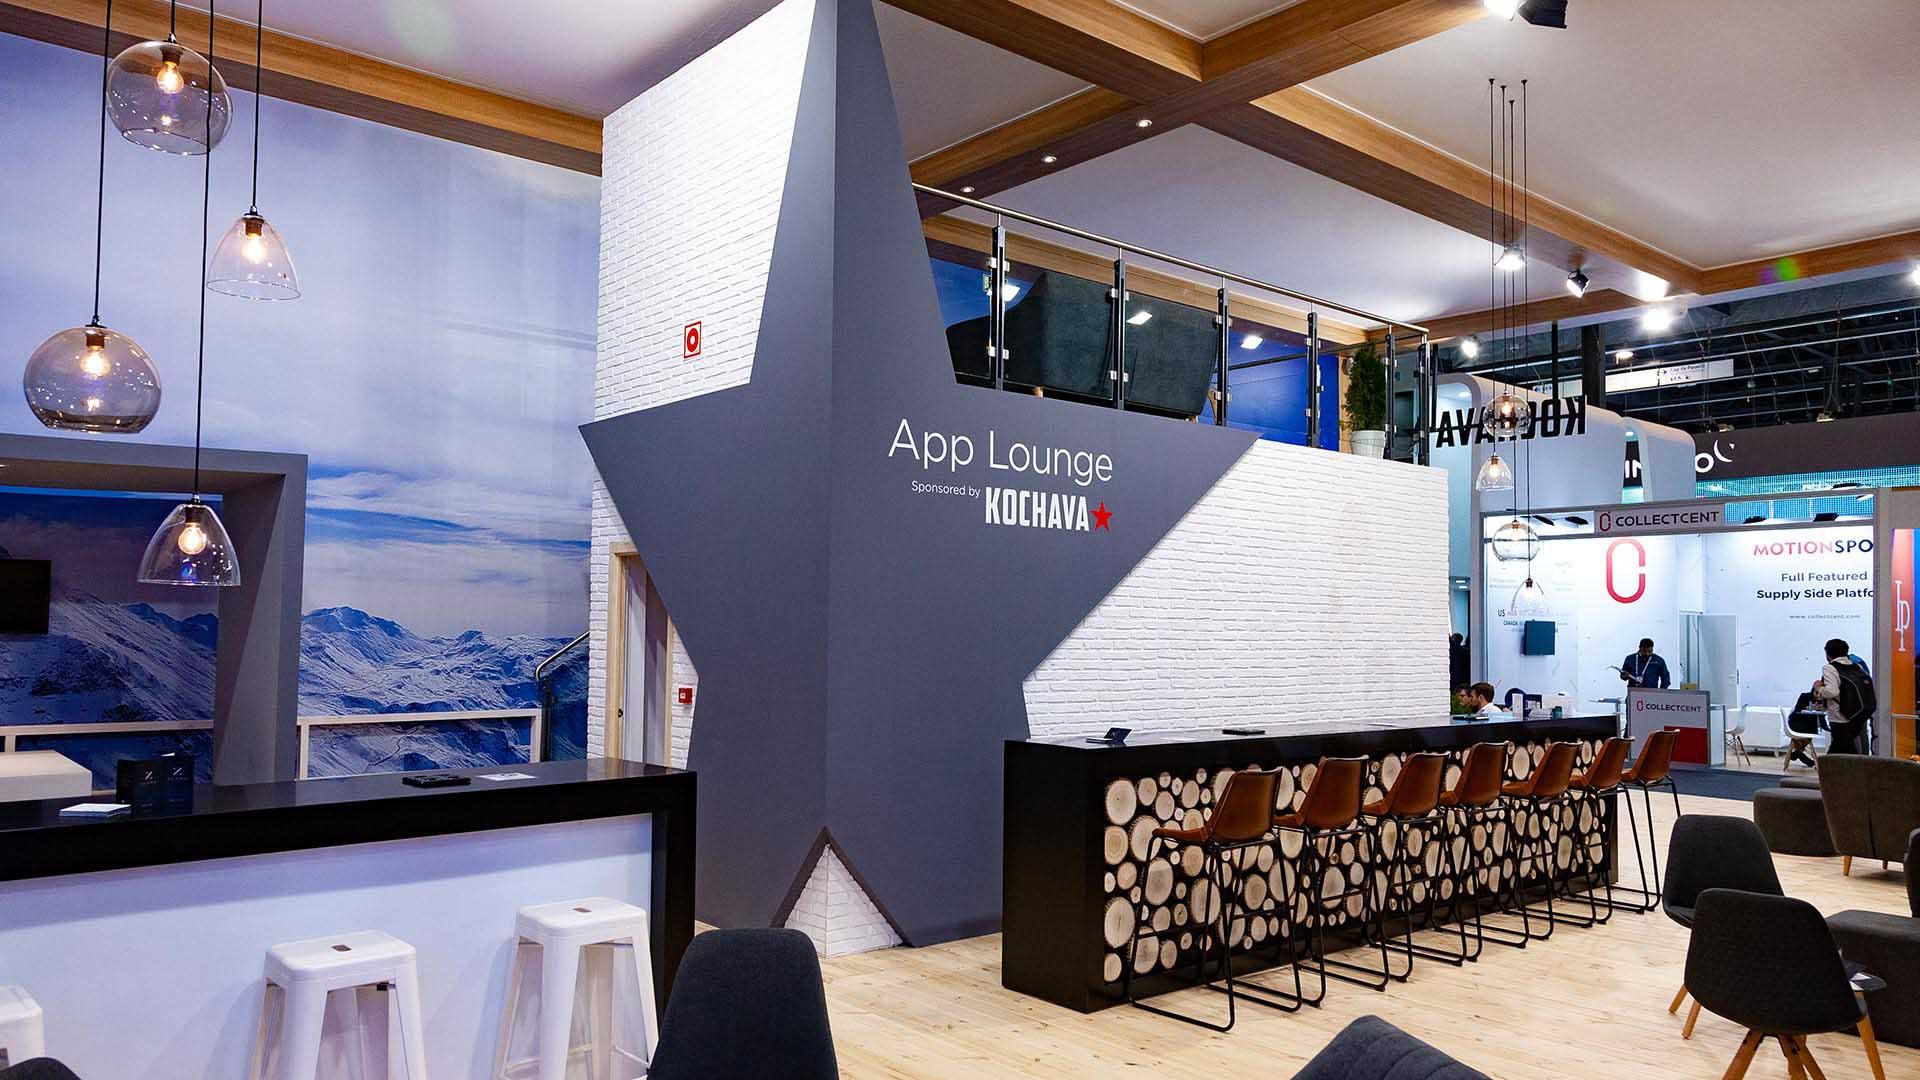 Mobile world congress. Kochava stand design